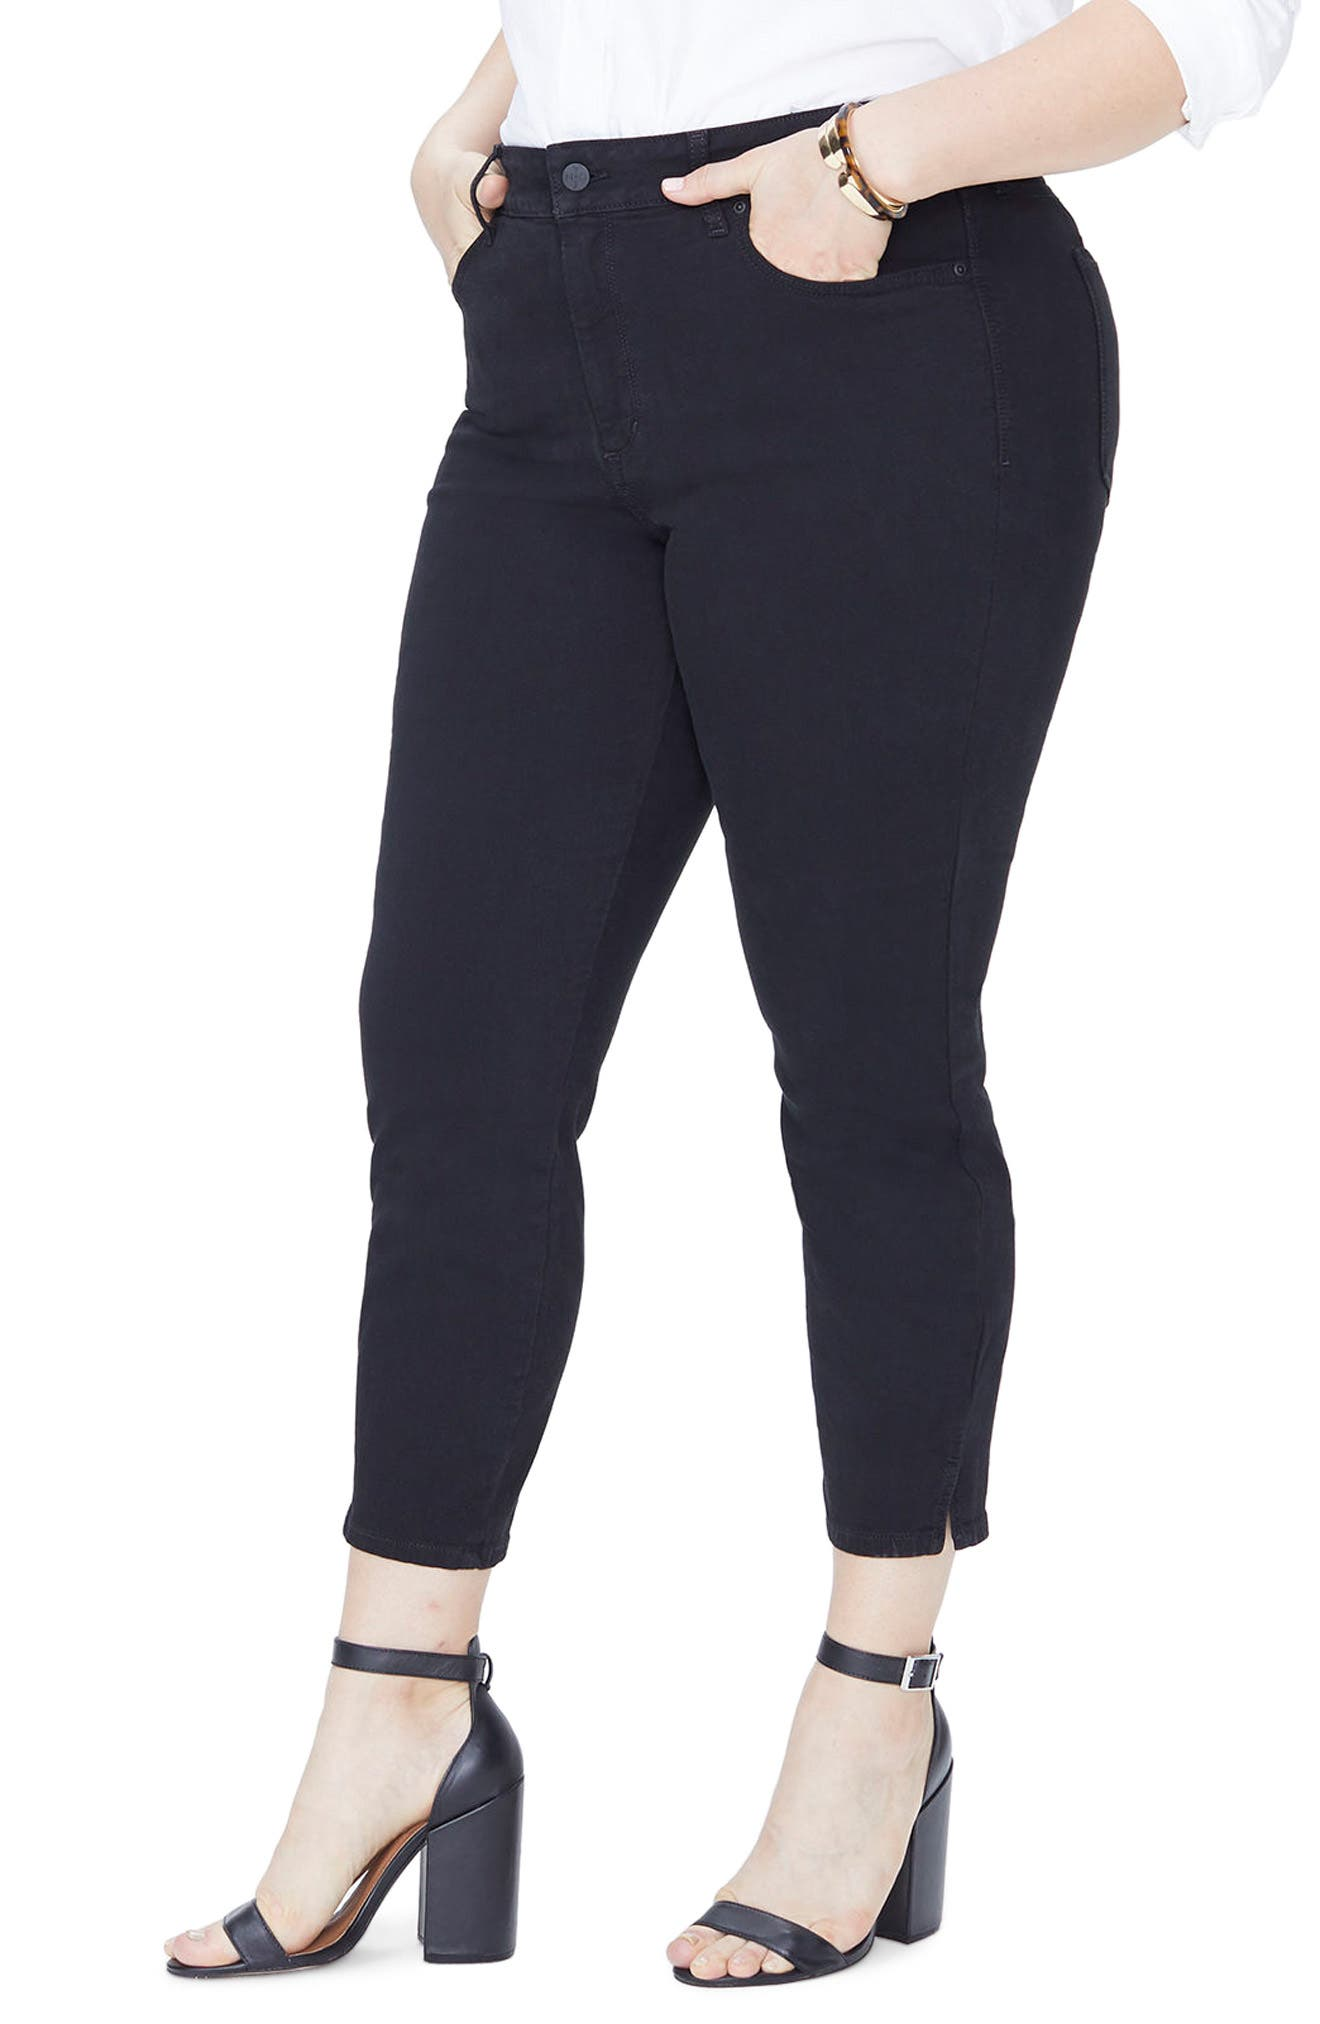 Ami Ankle Skinny Jeans,                             Main thumbnail 1, color,                             Black